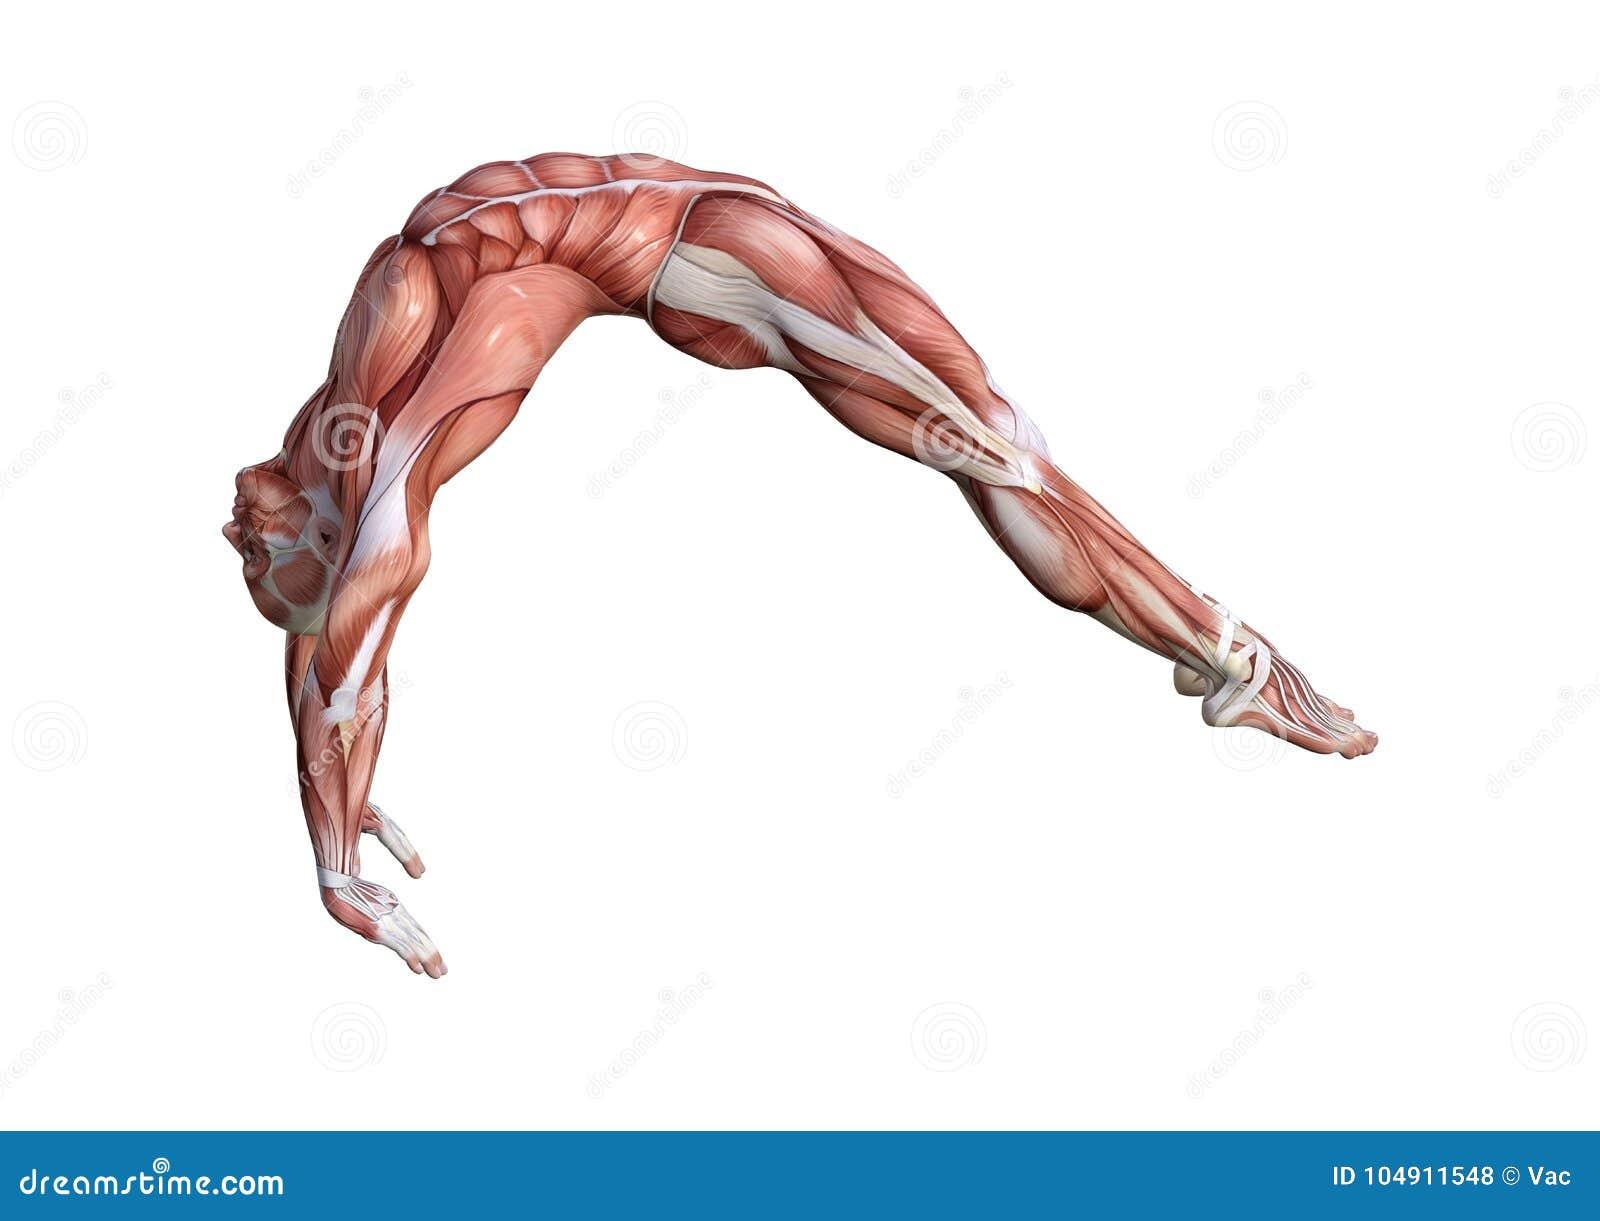 3D Rendering Male Anatomy Figure On White Stock Illustration ... on yoga energy, yoga international, yoga back, yoga stretches, yoga adrenal glands, yoga leg workout, yoga history, yoga skin, yoga peace, yoga anatomy, yoga strength, yoga mind, yoga bones,